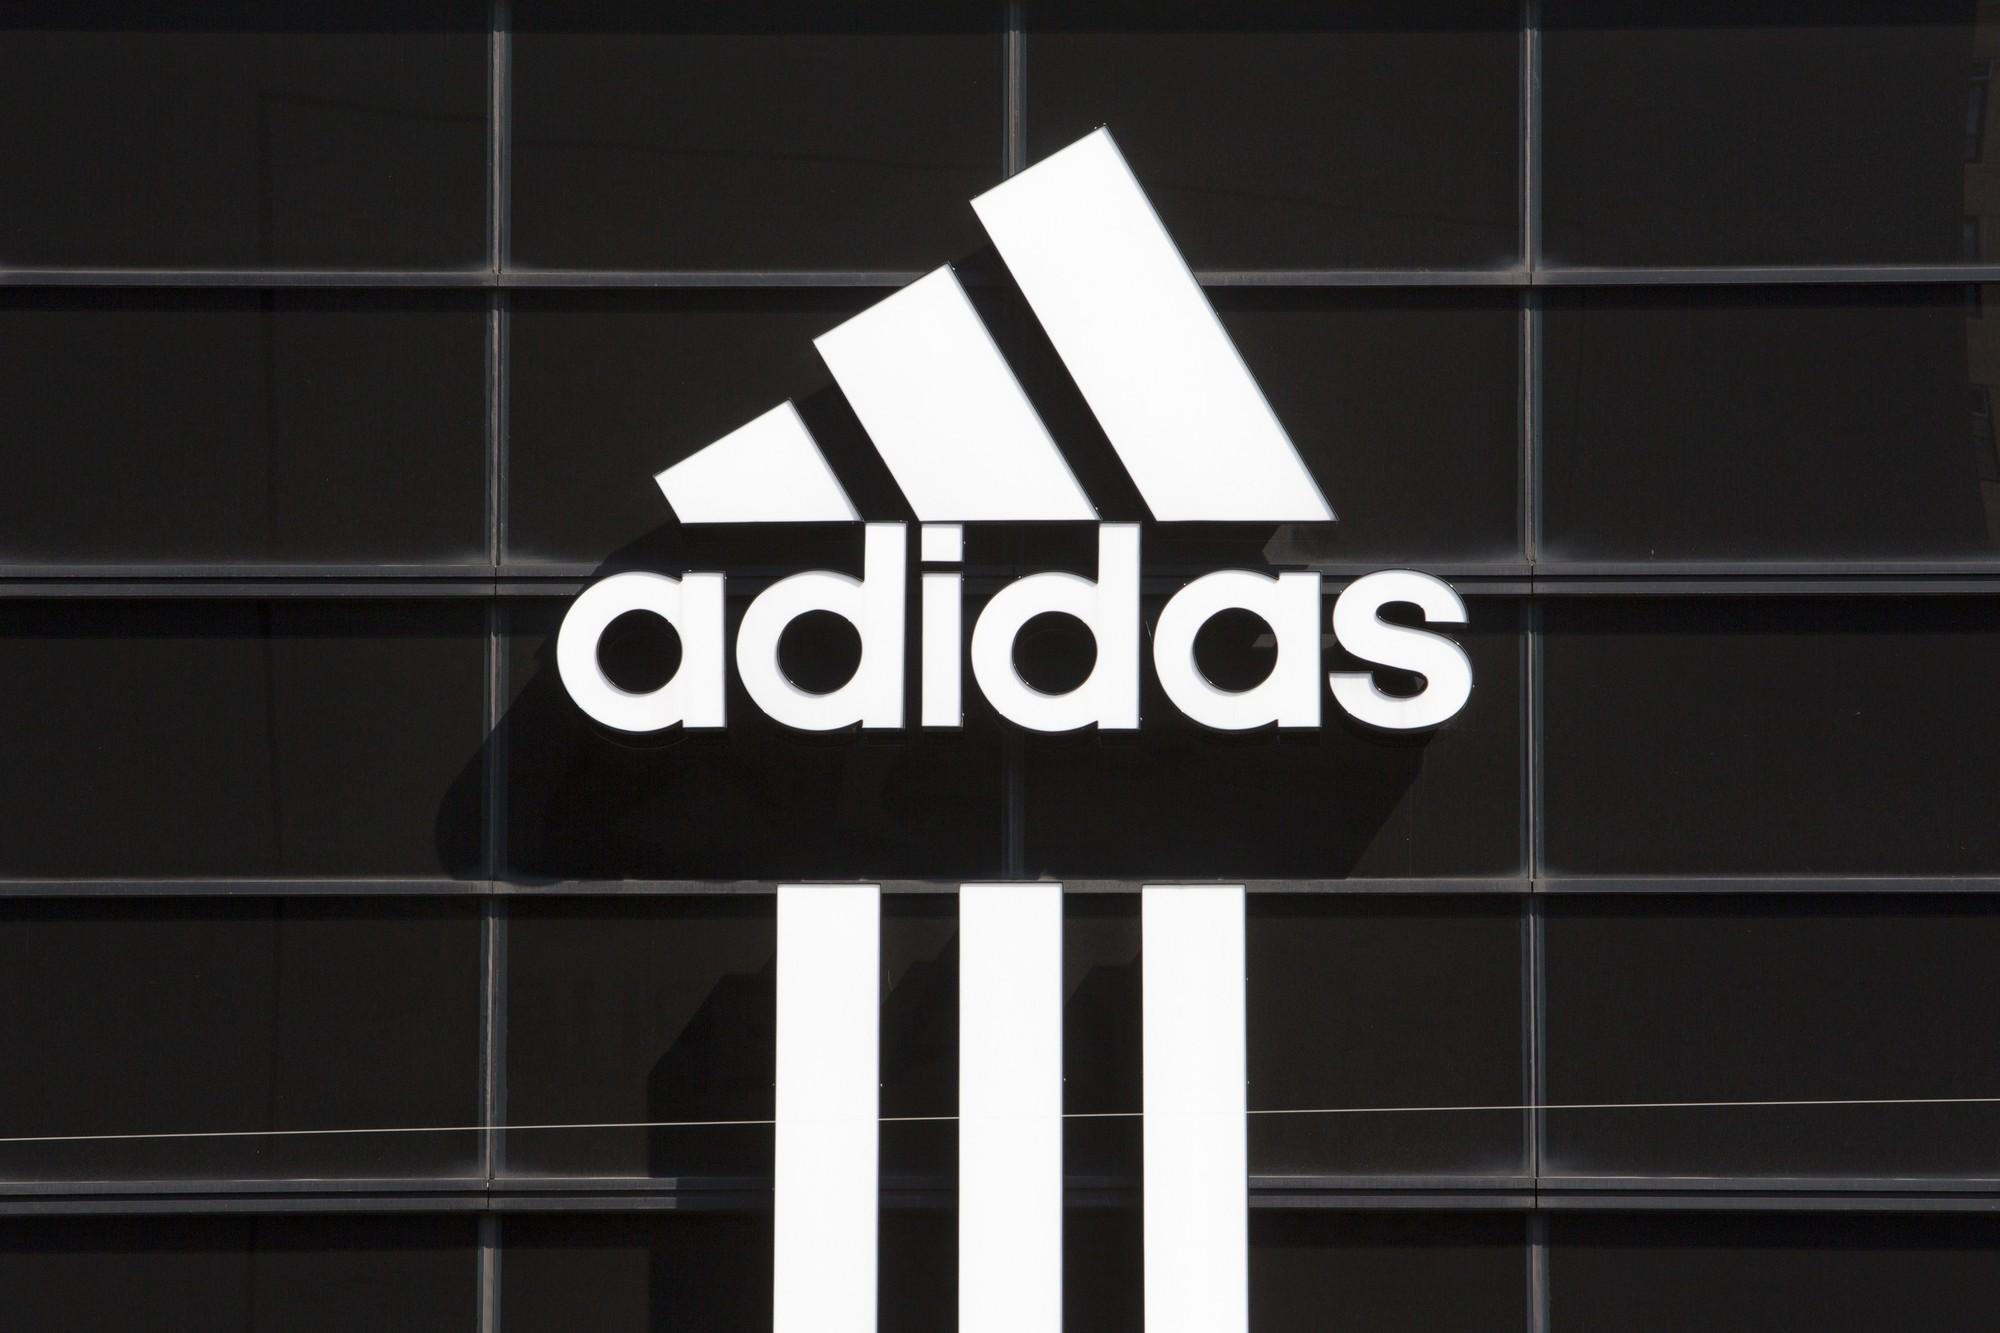 Adidas - historia marki bf9438cc51